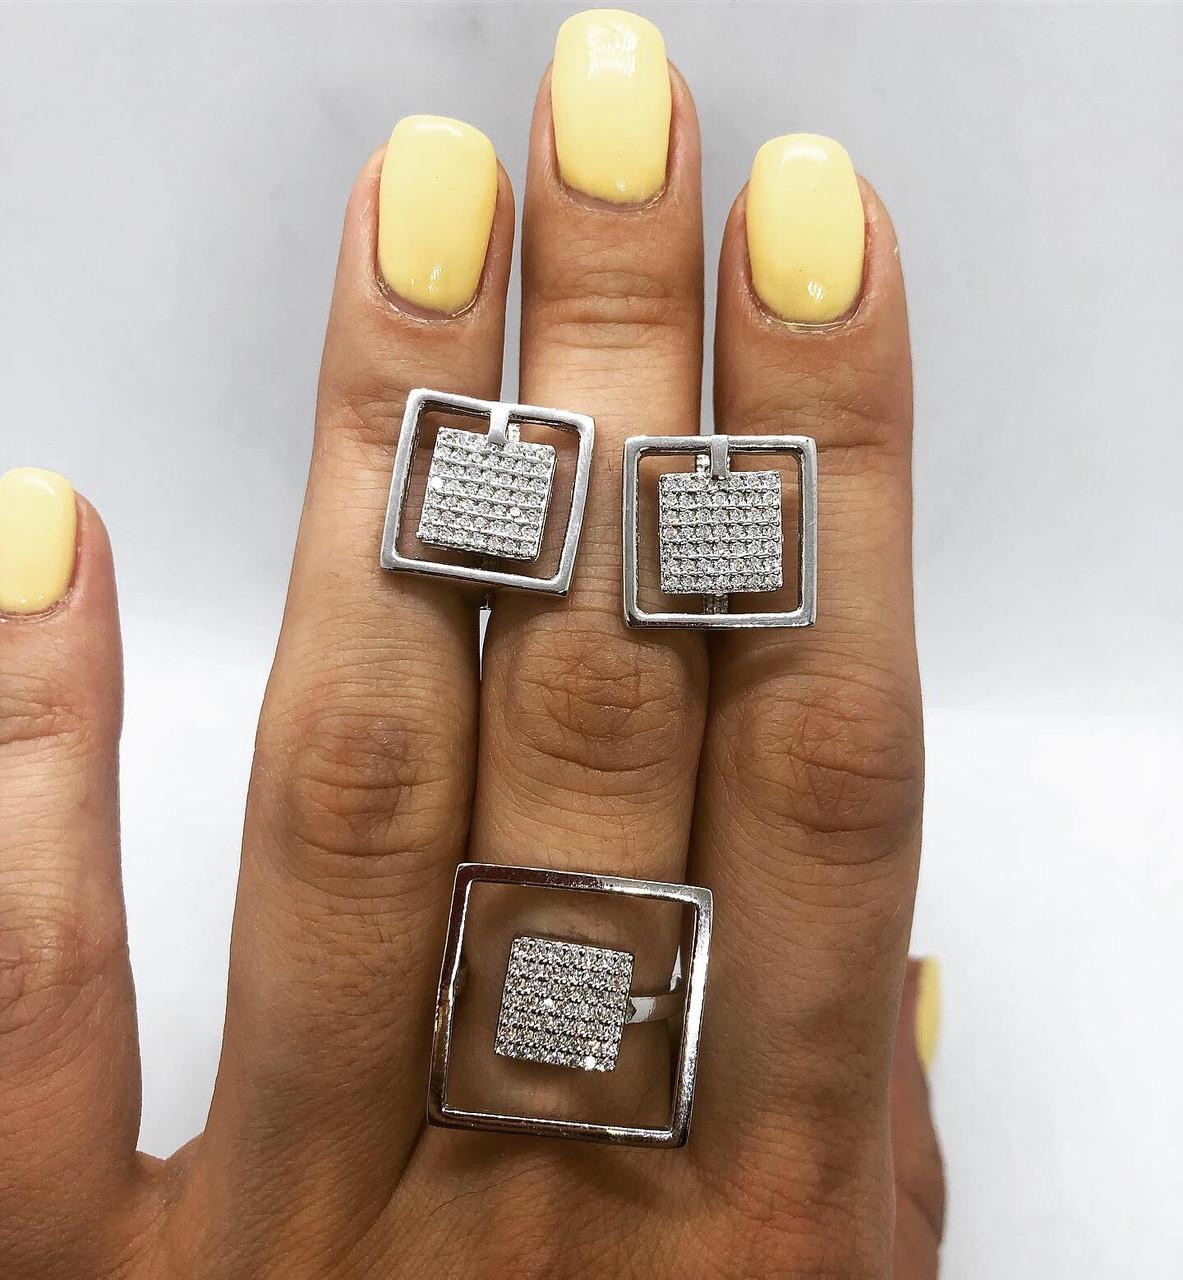 Набор украшений My Jewels из серебра 925 квадрат белый, камни Swarovski (размер 17-17,5), фото 1